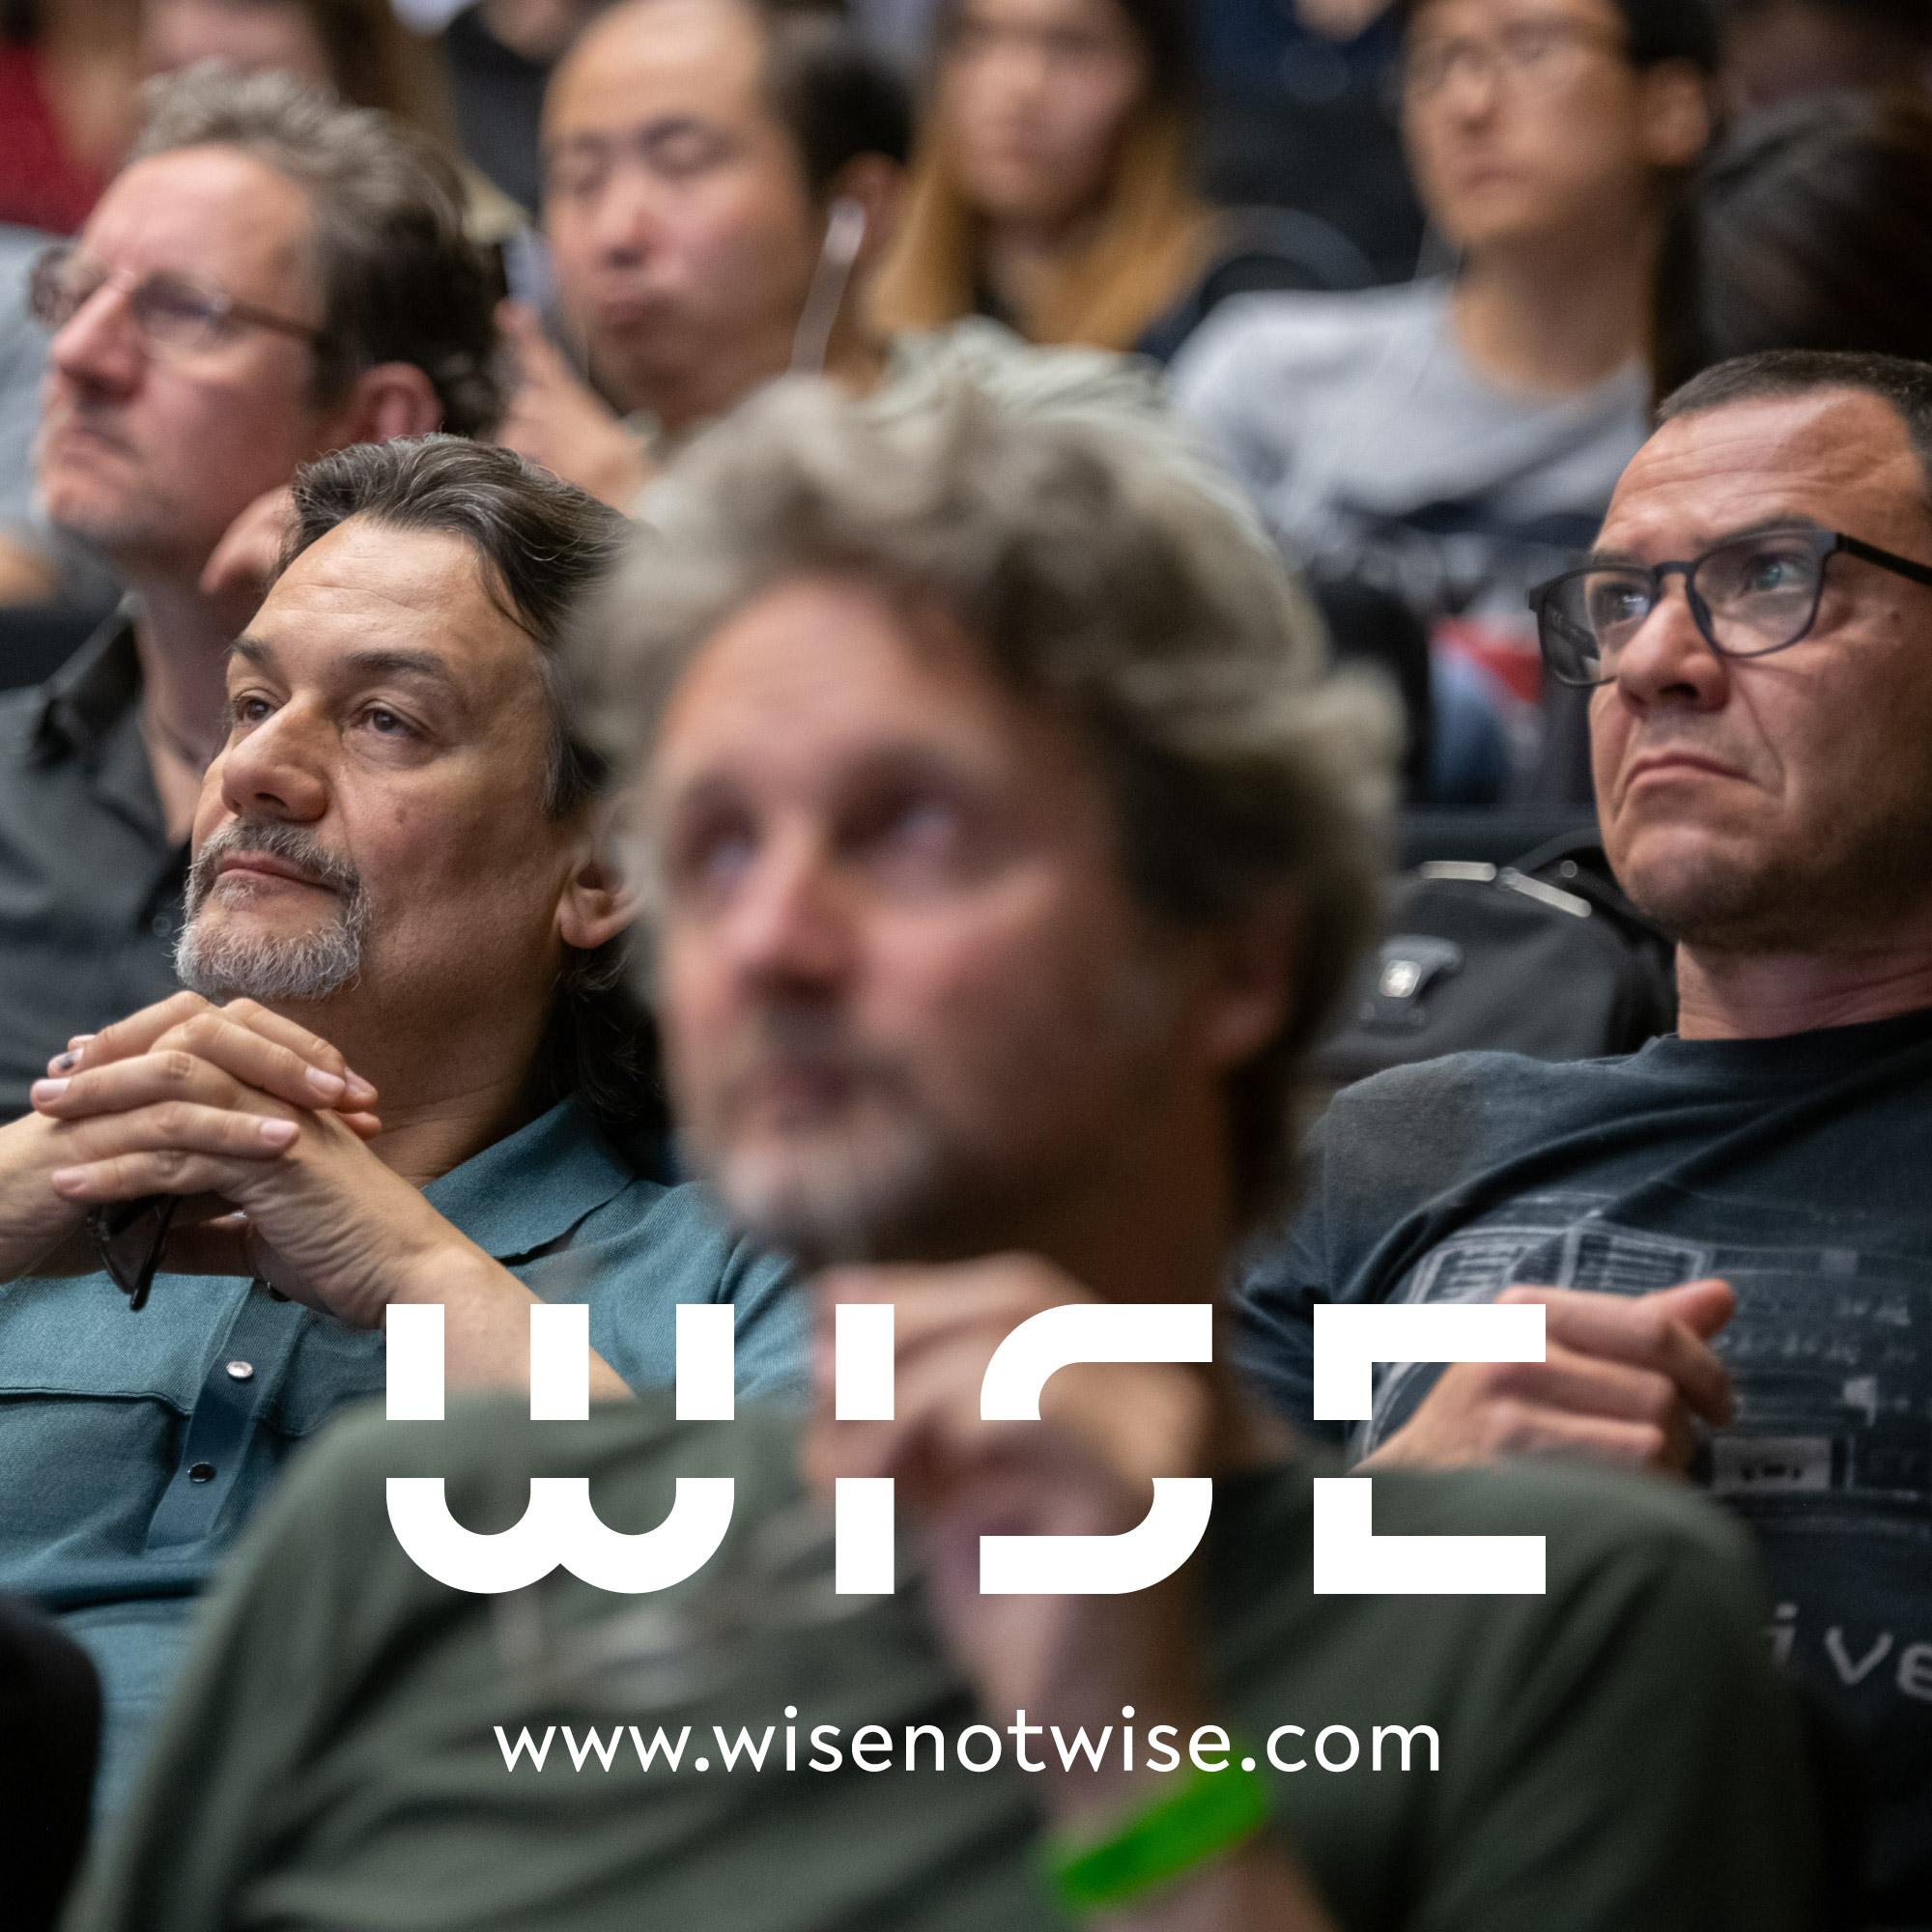 WISE_RECAP_2019_DAY_1_25.jpg